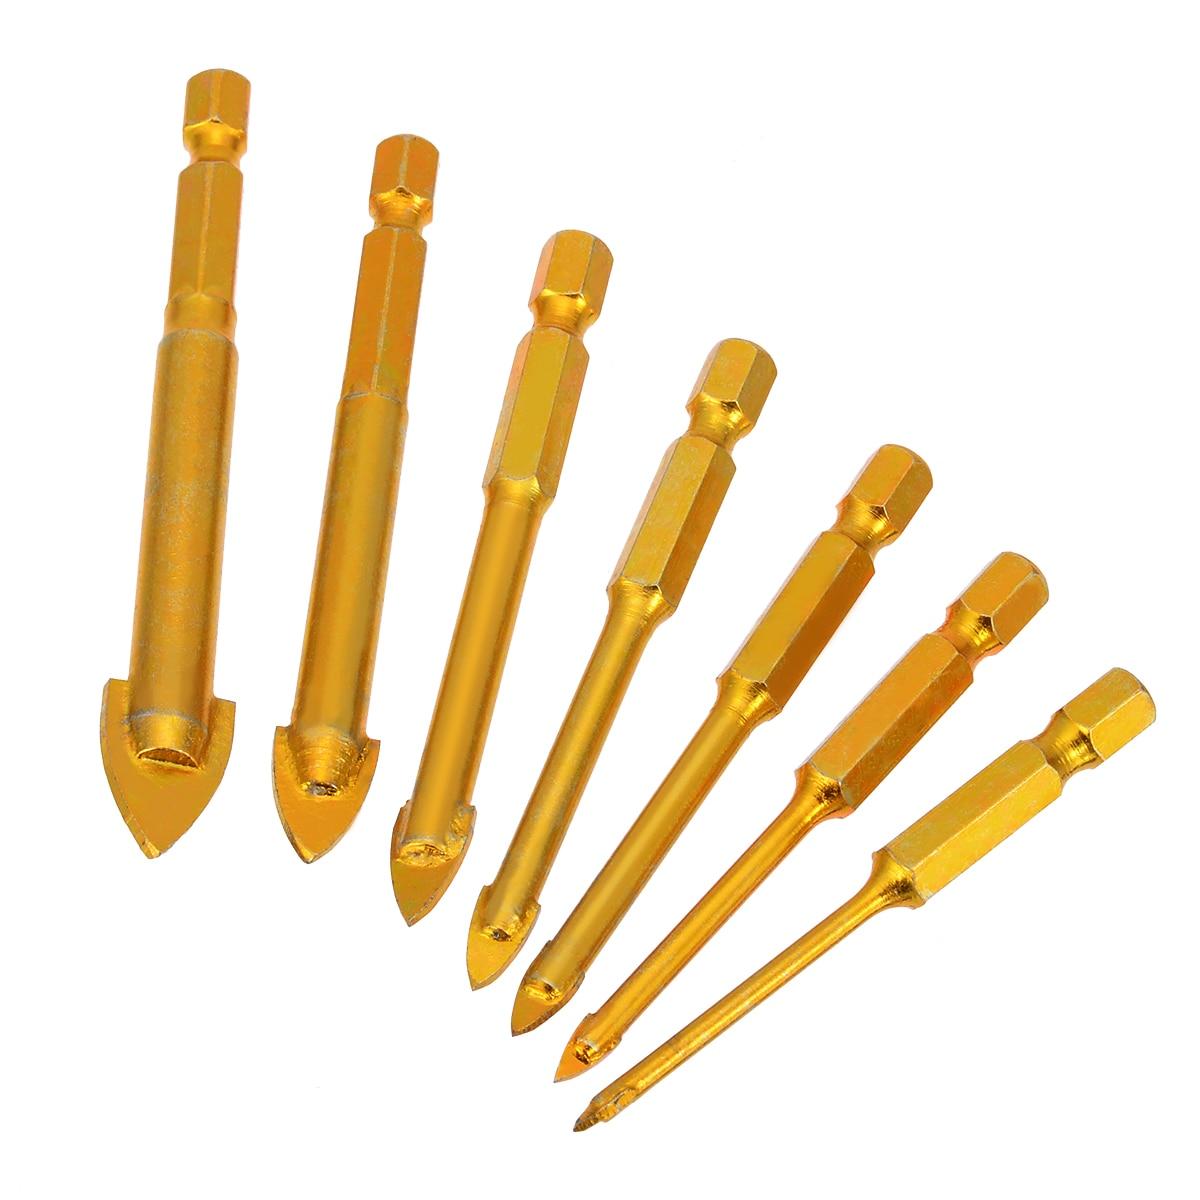 QUALITY TILE//GLASS CERAMIC DRILL BIT 4mm x 75mm Hex Shank Tungsten Carbide Tip